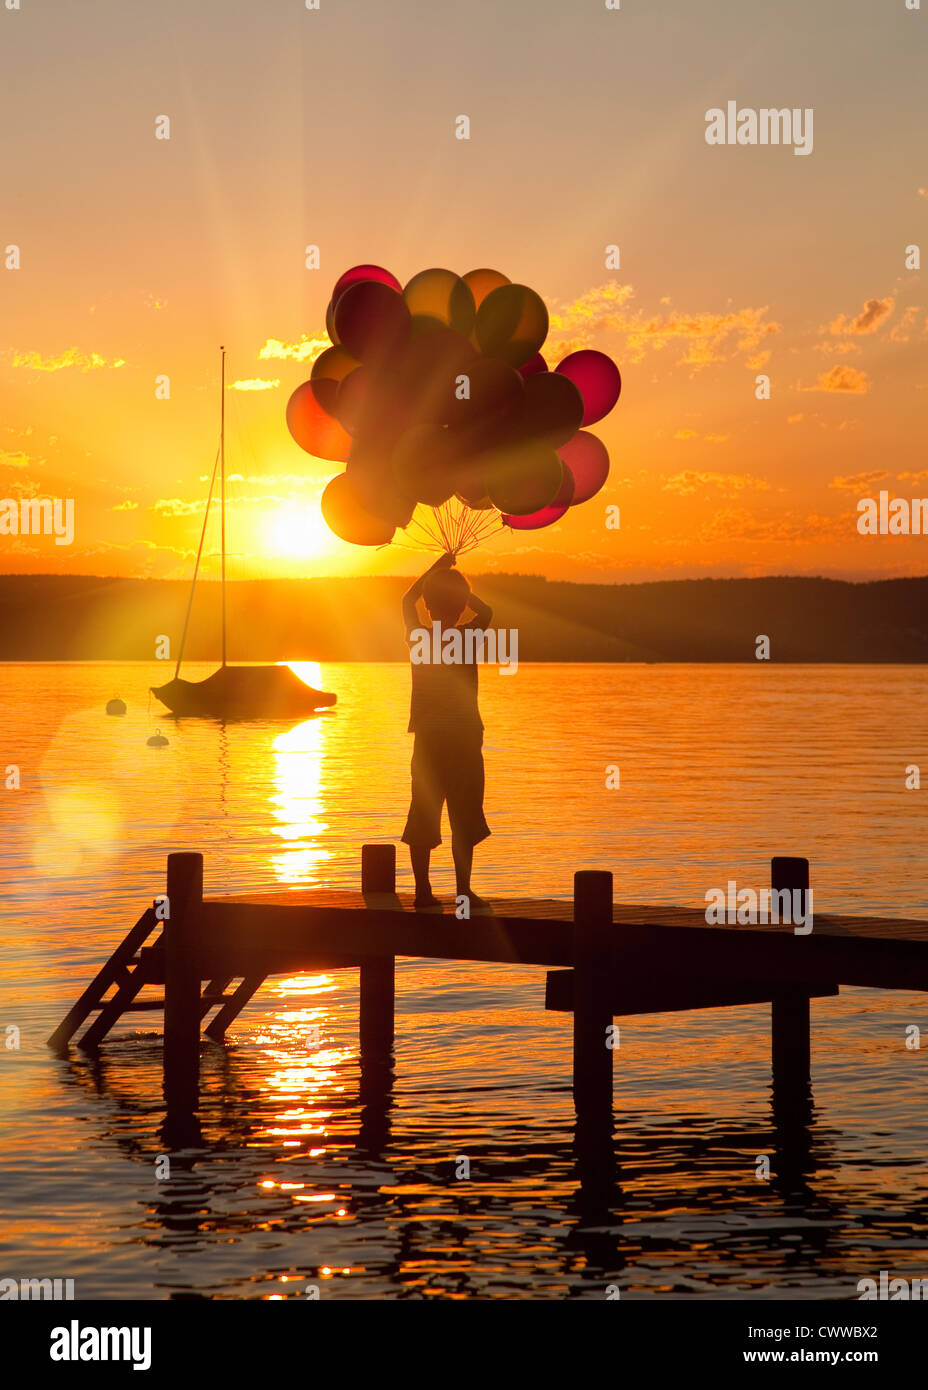 Boy holding balloons on wooden dock Stock Photo